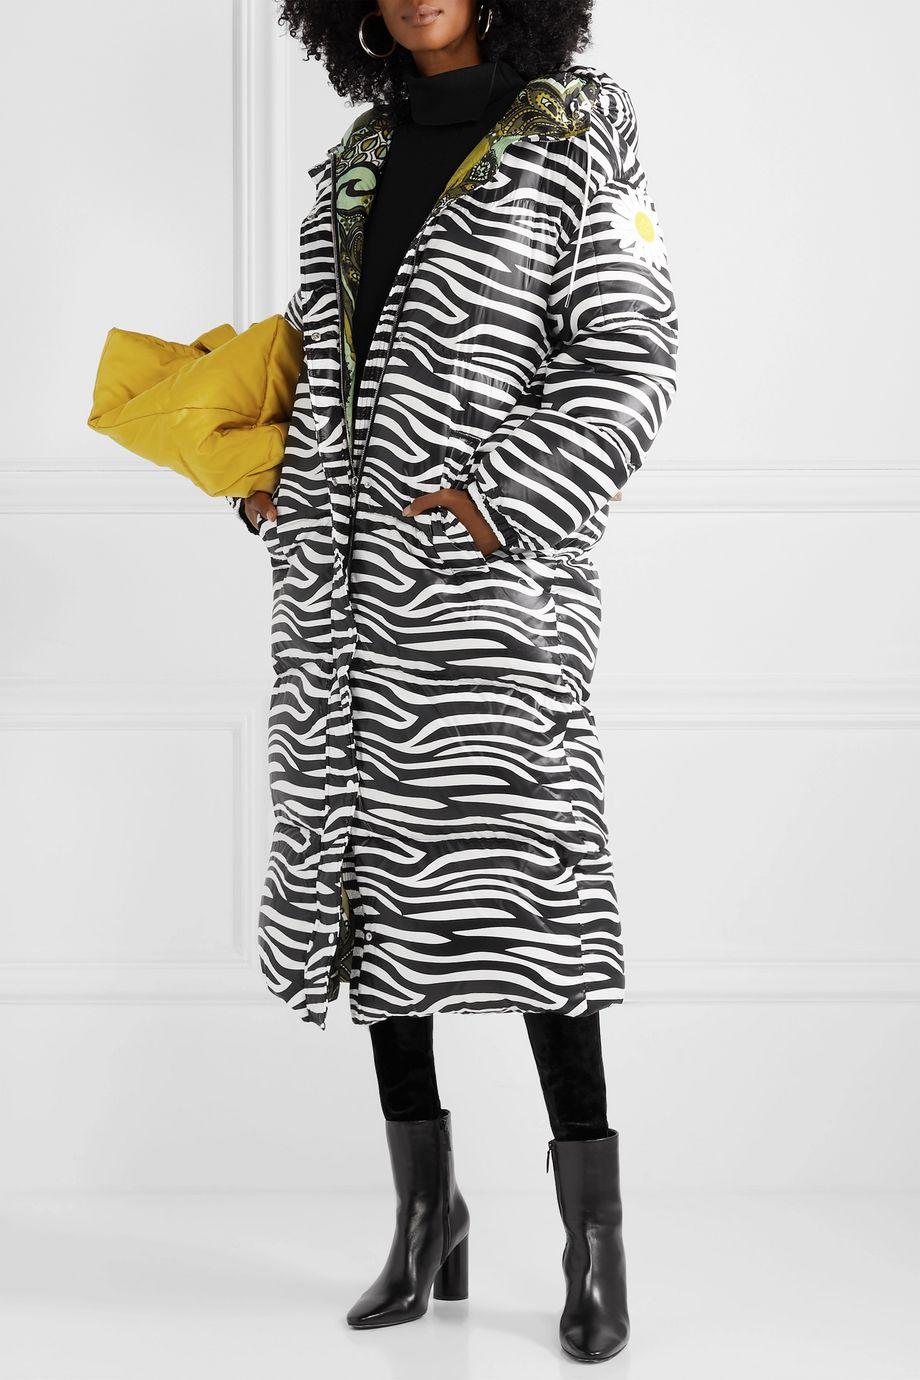 Moncler Genius + 0 Richard Quinn Tippi oversized zebra-print quilted shell down coat